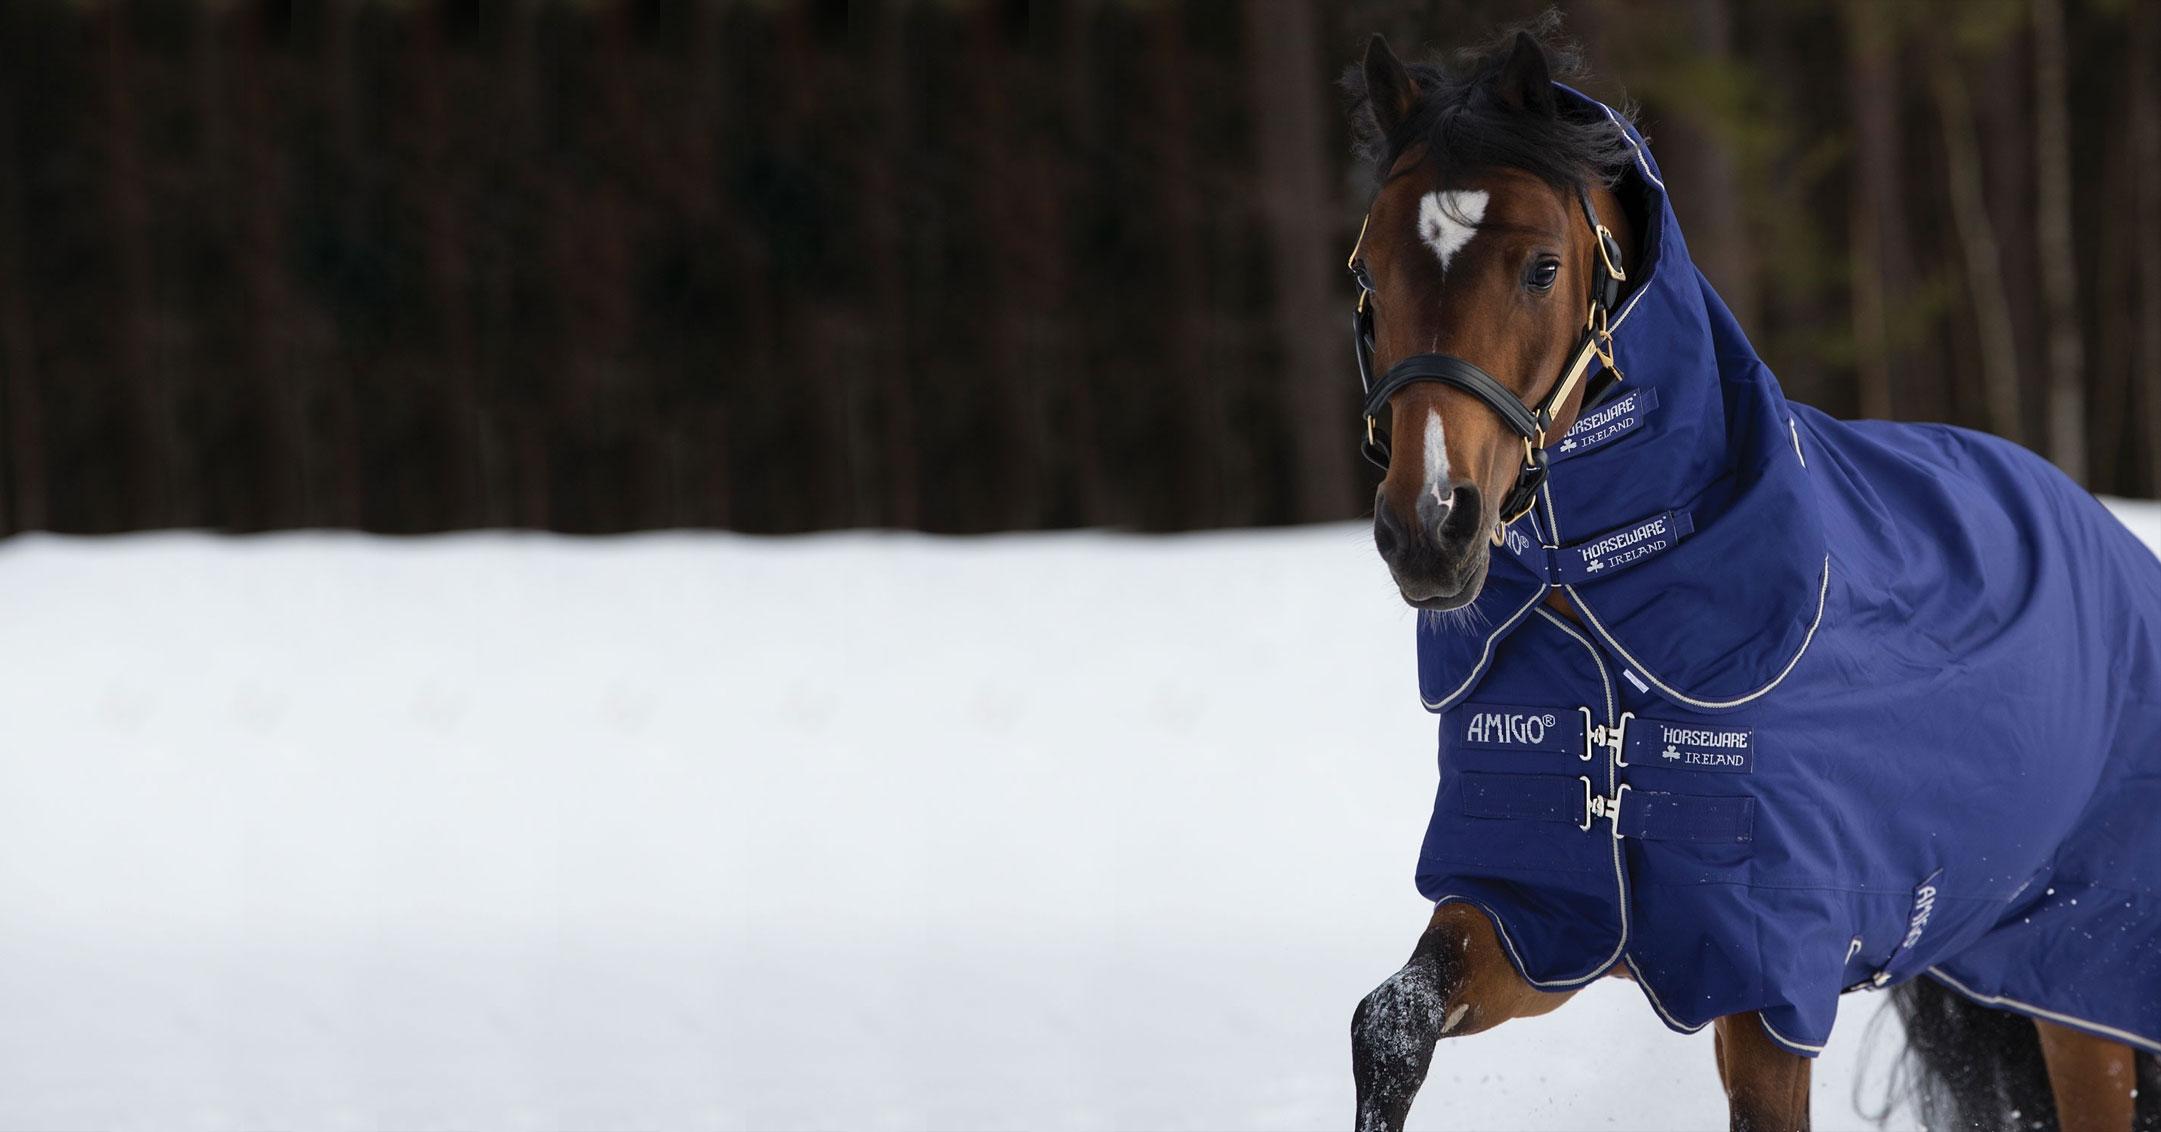 vendita online copertine per cavalli amigo hero 6 horseware